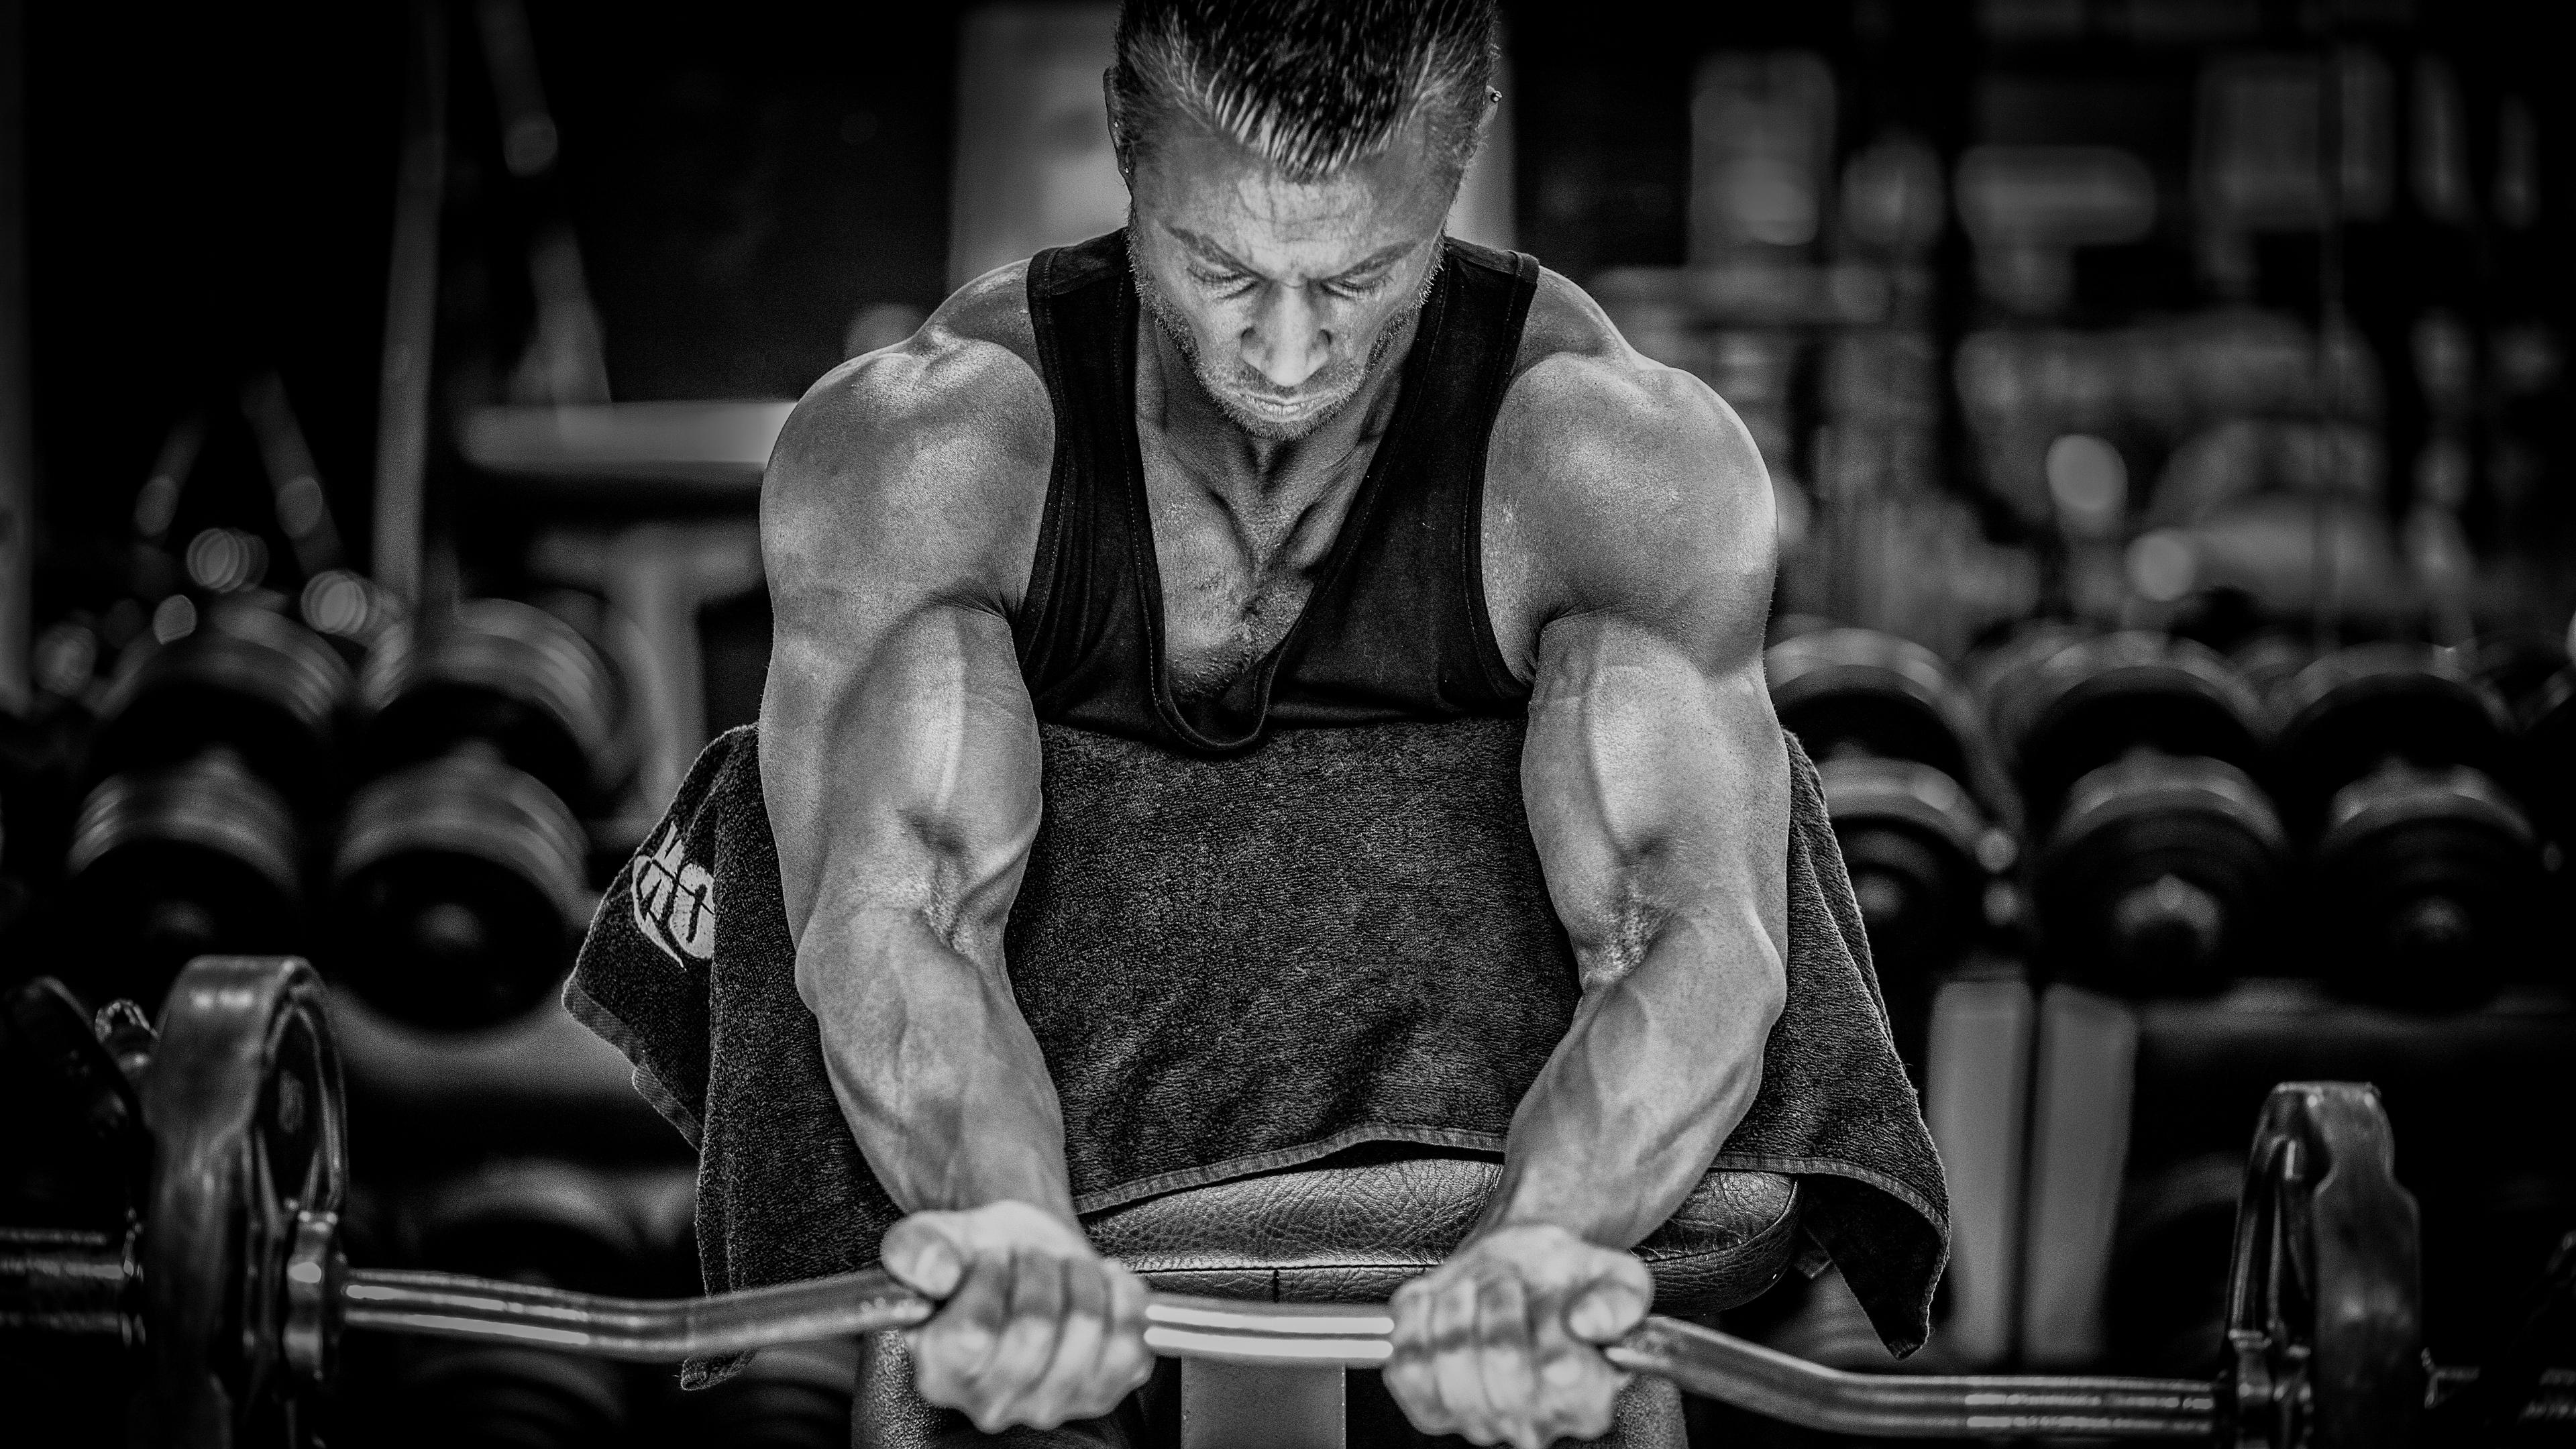 bodybuilding bodybuilder muscle rod 4k 1540061557 - bodybuilding, bodybuilder, muscle, rod 4k - Muscle, bodybuilding, bodybuilder